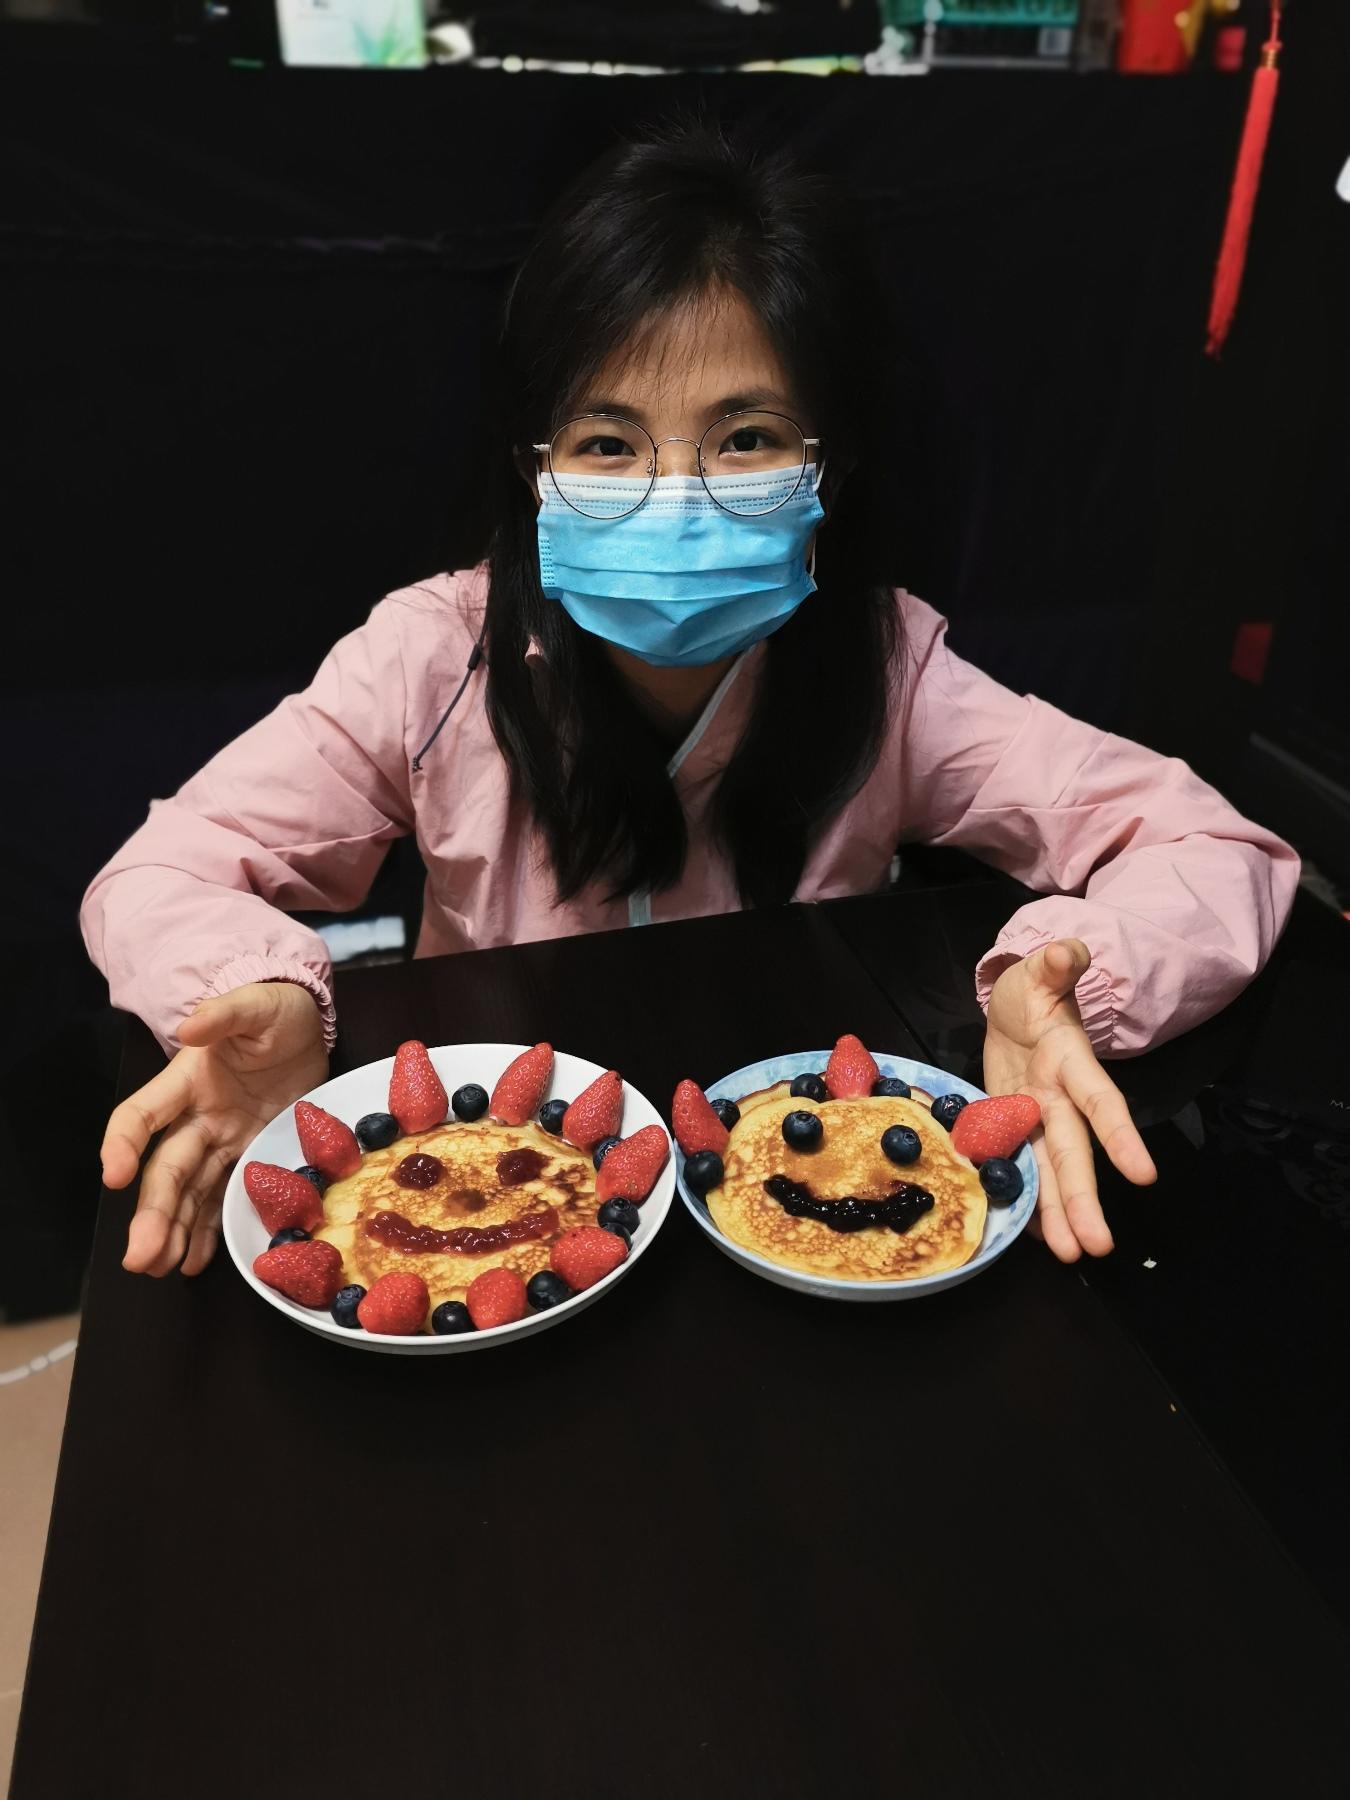 http://www.npc.edu.hk/sites/default/files/li_si_ying_1.jpg